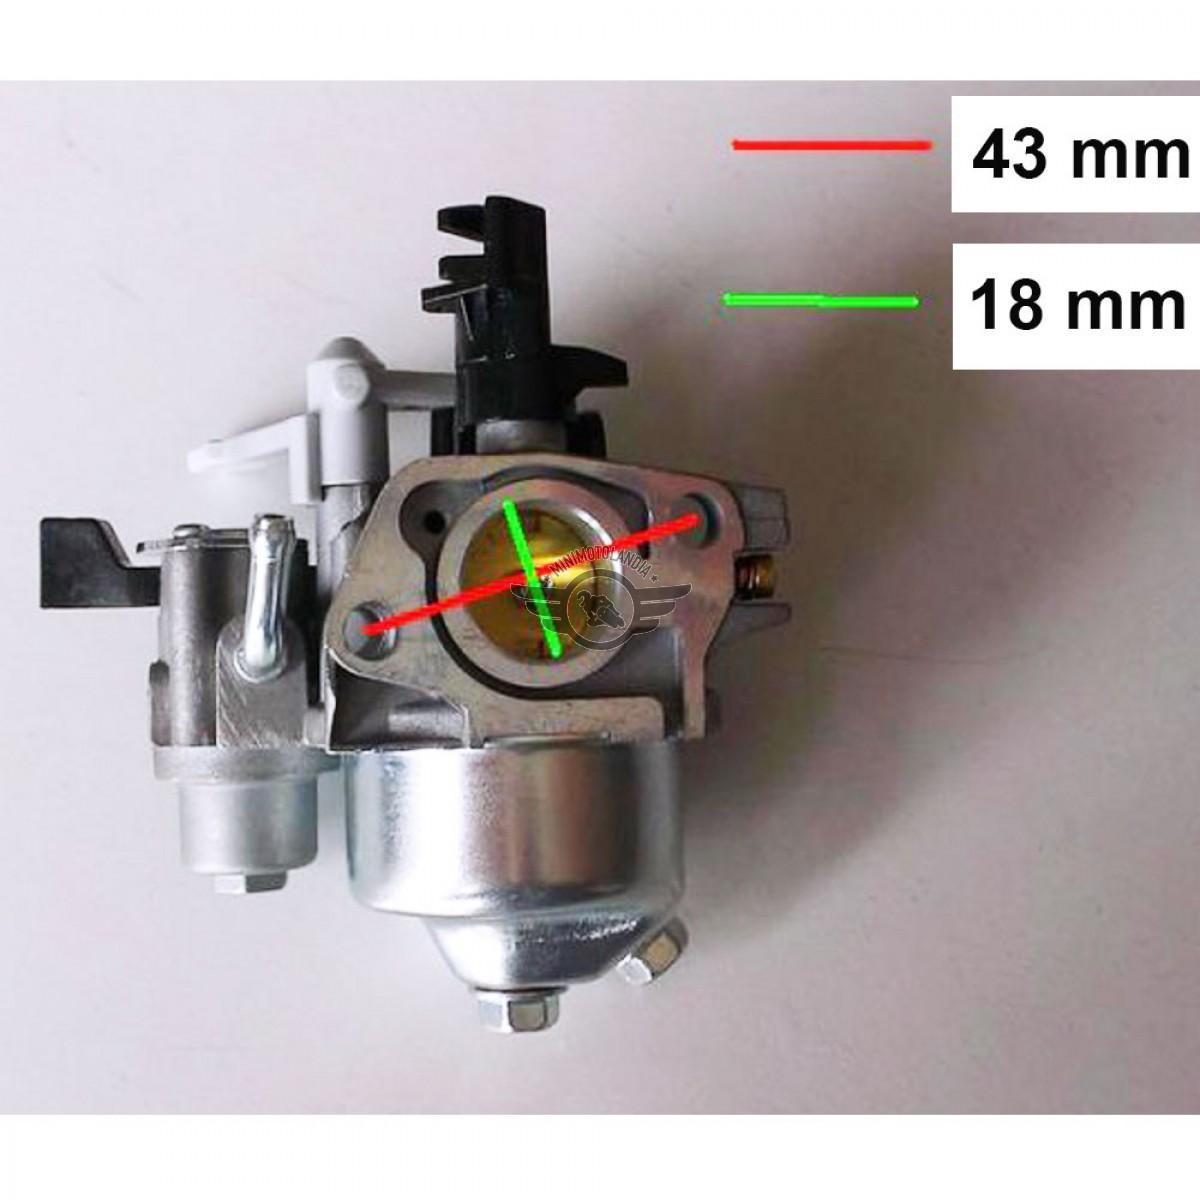 Carburatore Per Motozappa Motore 6 5 Hp 196 200cc Minimotolandia